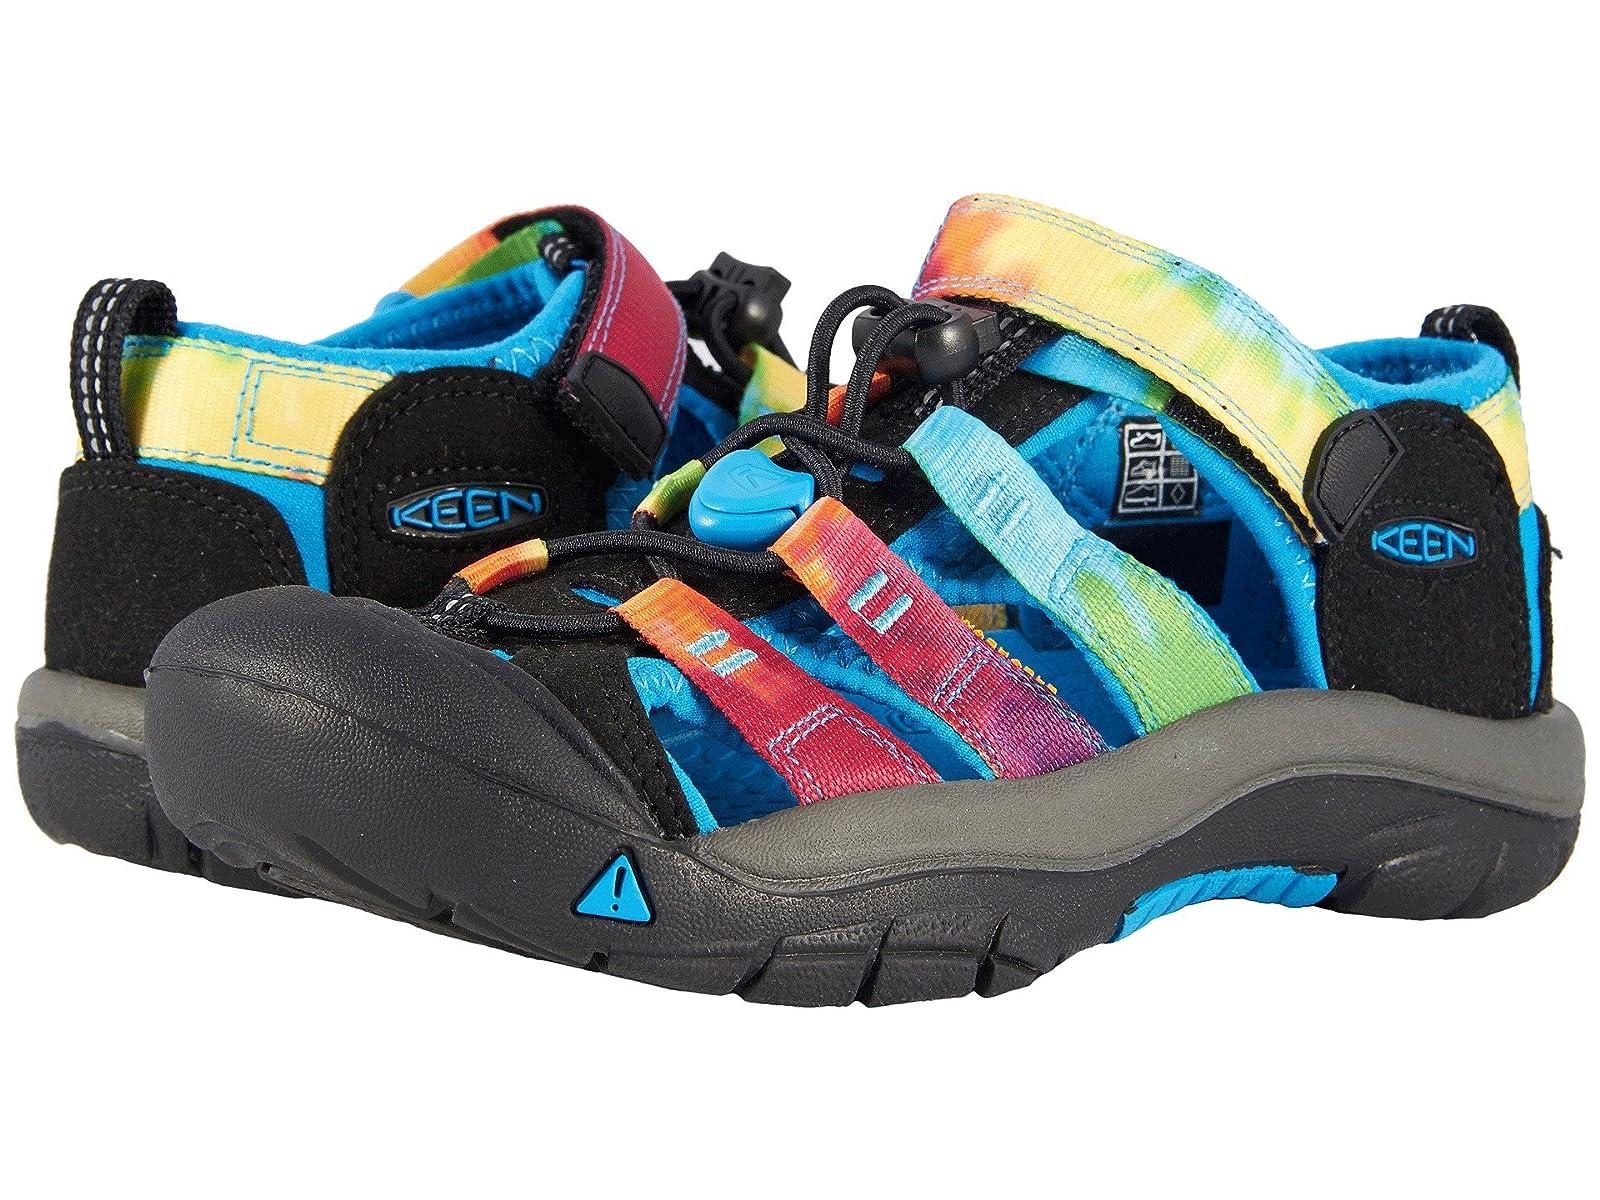 Keen Kids Newport H2 (Little Kid/Big Kid)Atmospheric grades have affordable shoes